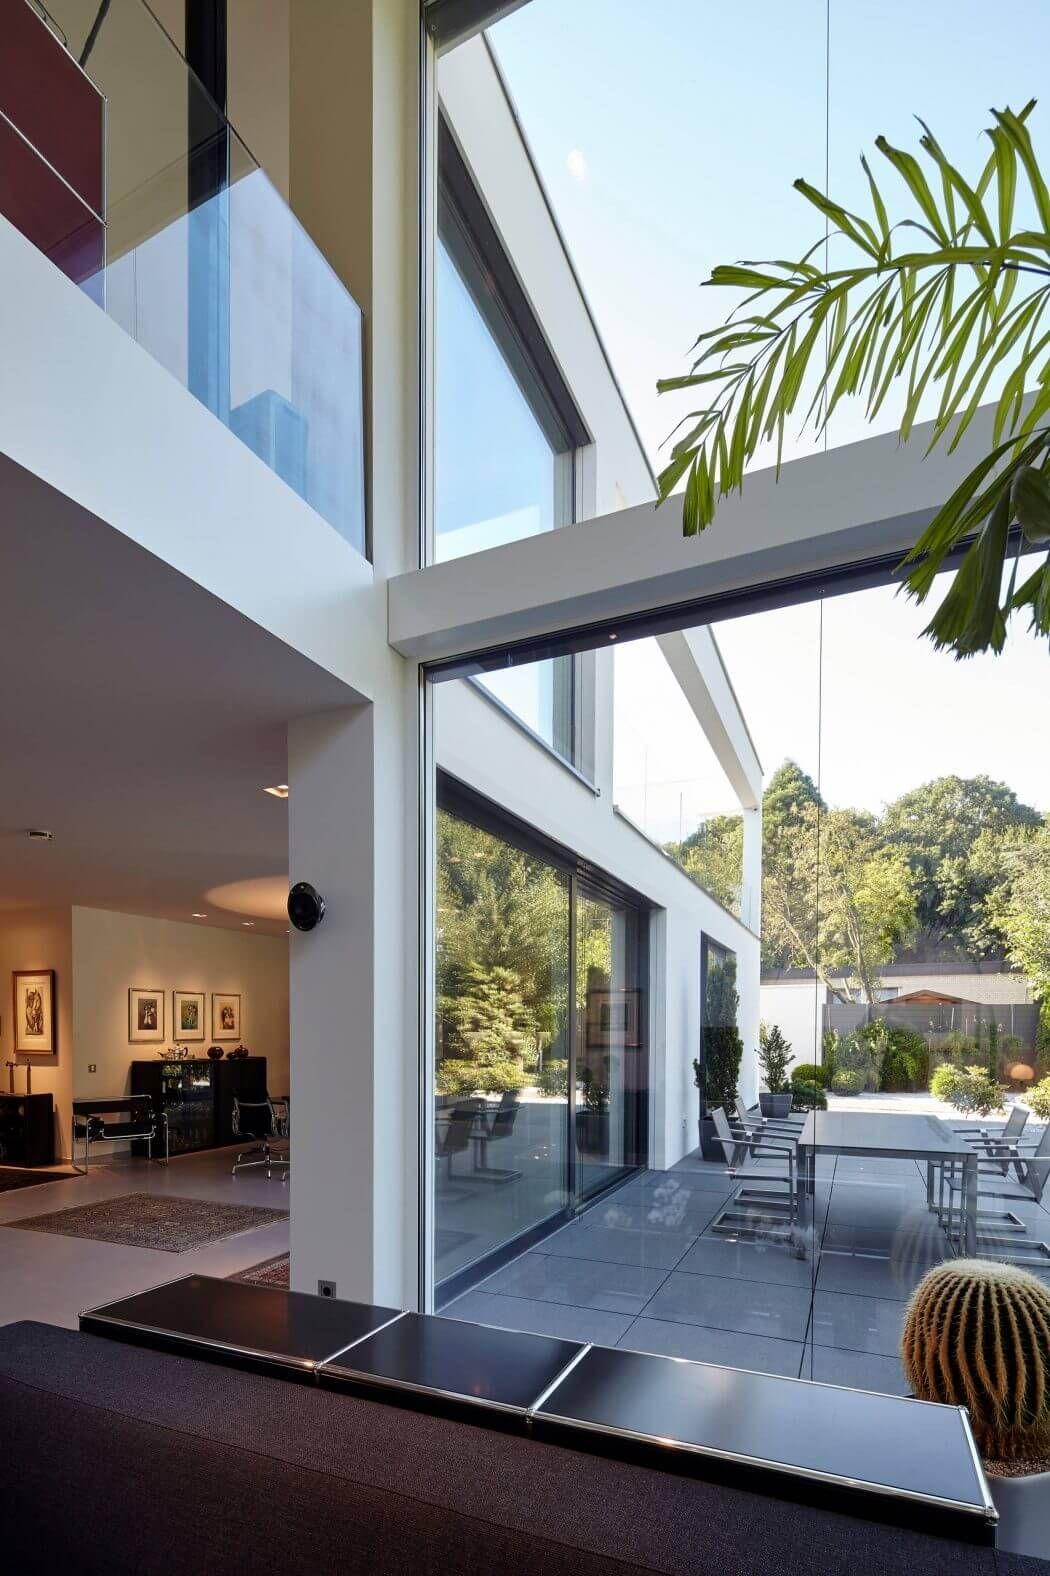 Casa Dormagen villa in dormagen by falke architekten villas architecture and